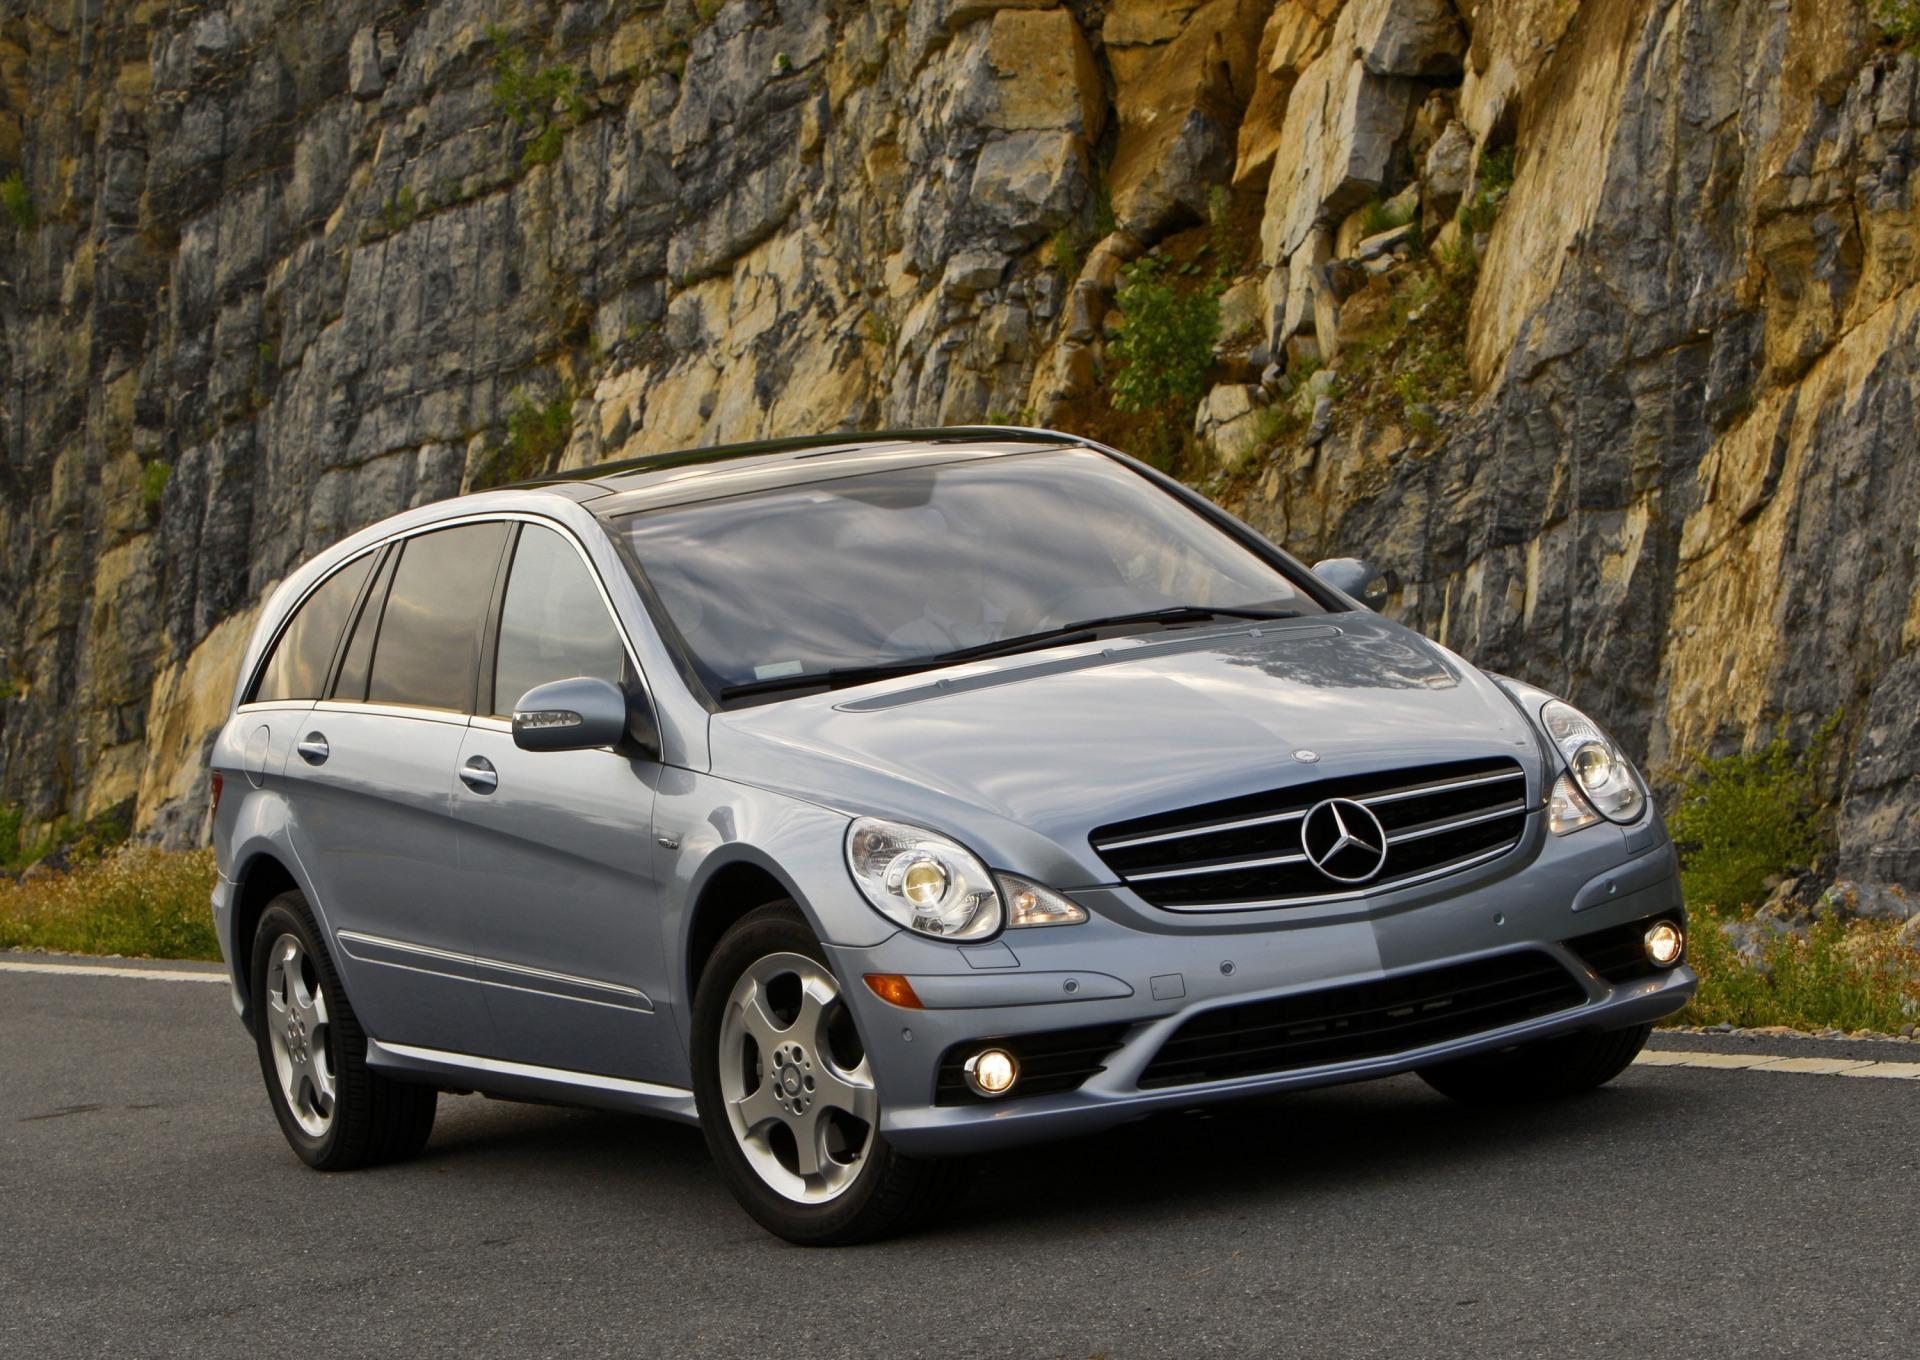 2010 Mercedes Benz R Class Conceptcarz Com